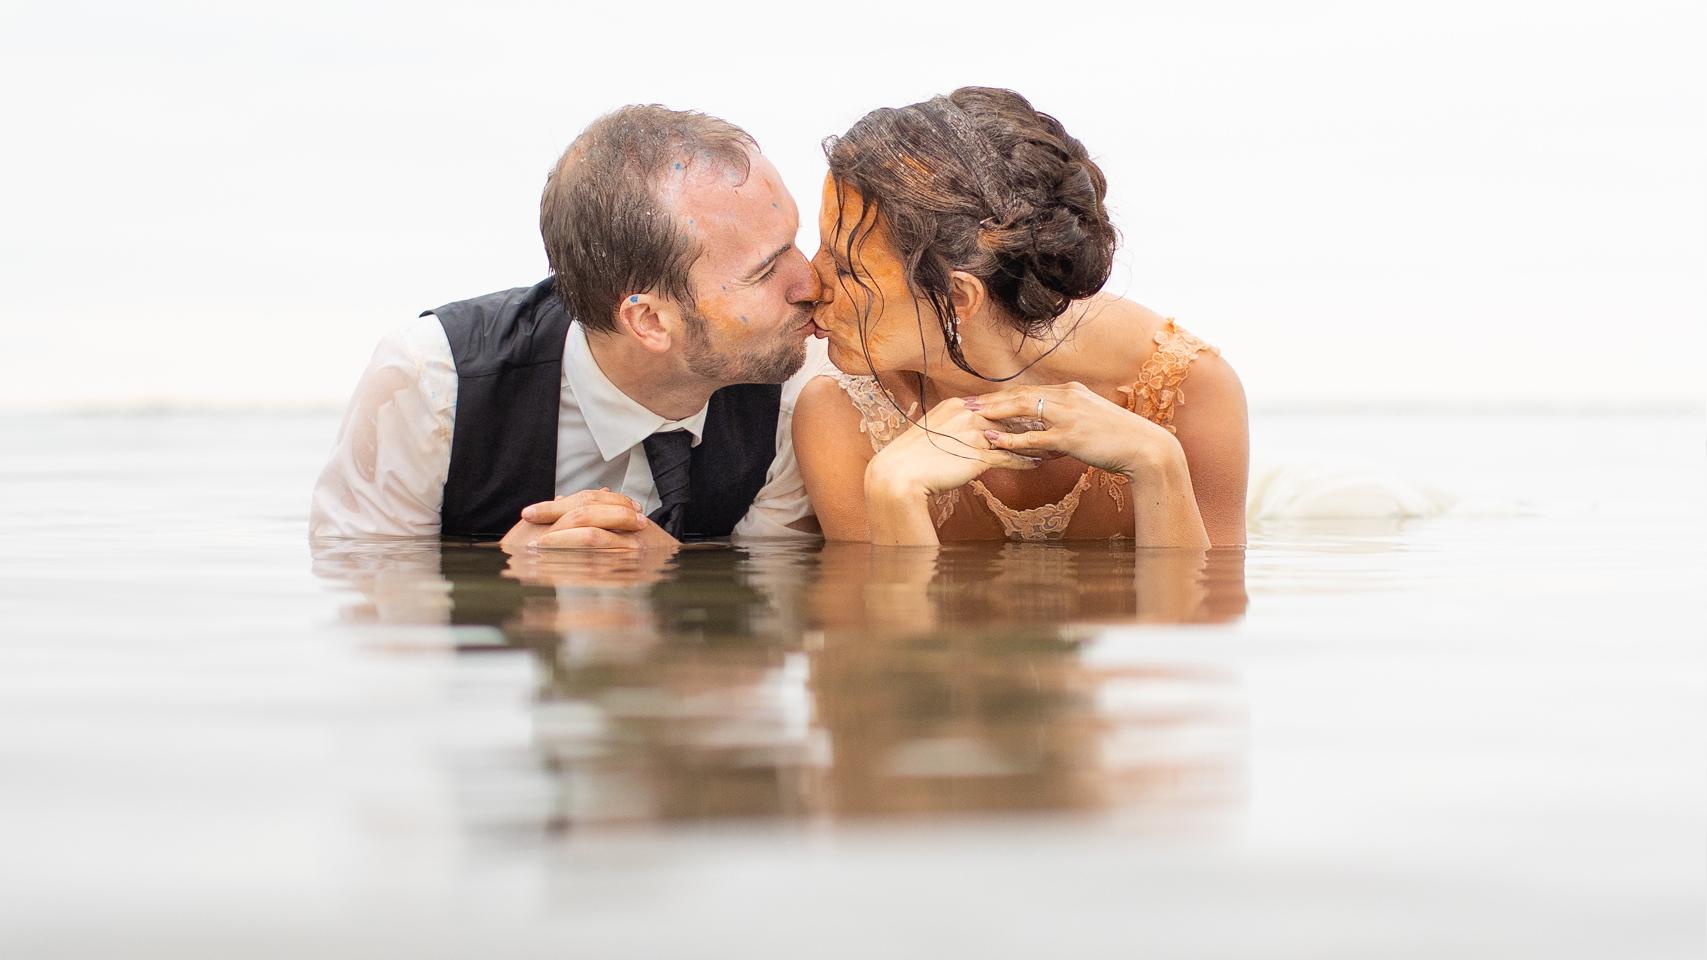 Hochzeitsfotograf Kiel - Wedding #love #hochzeitsfotos #weddingshoot #liebe # hochzeitsshooting #kiel